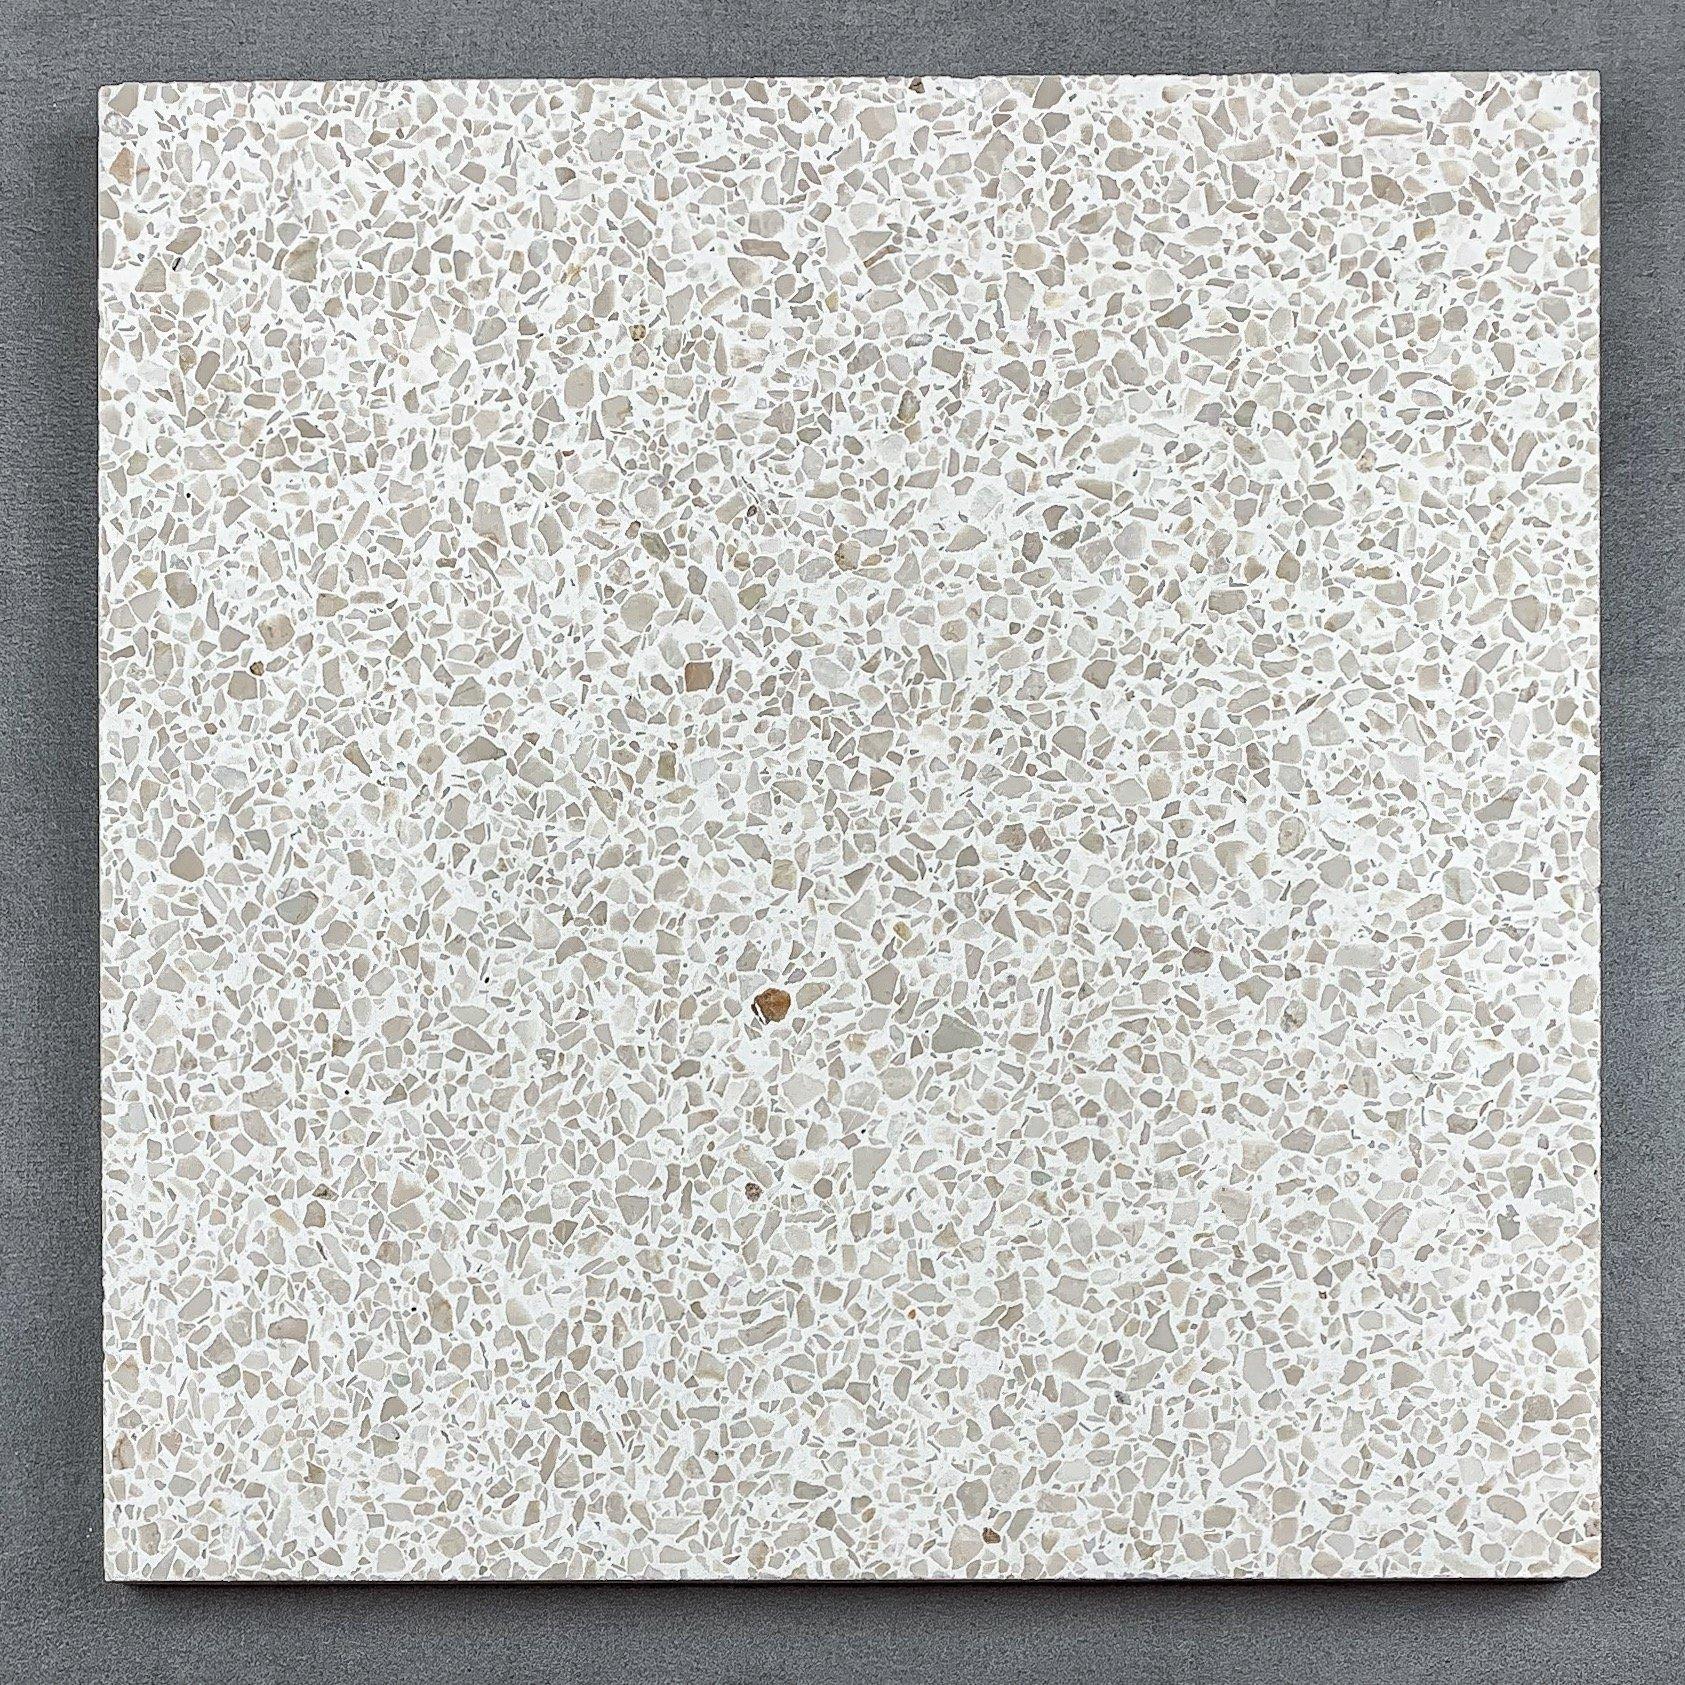 Praso 7mm Terrazzo Essential Tiles